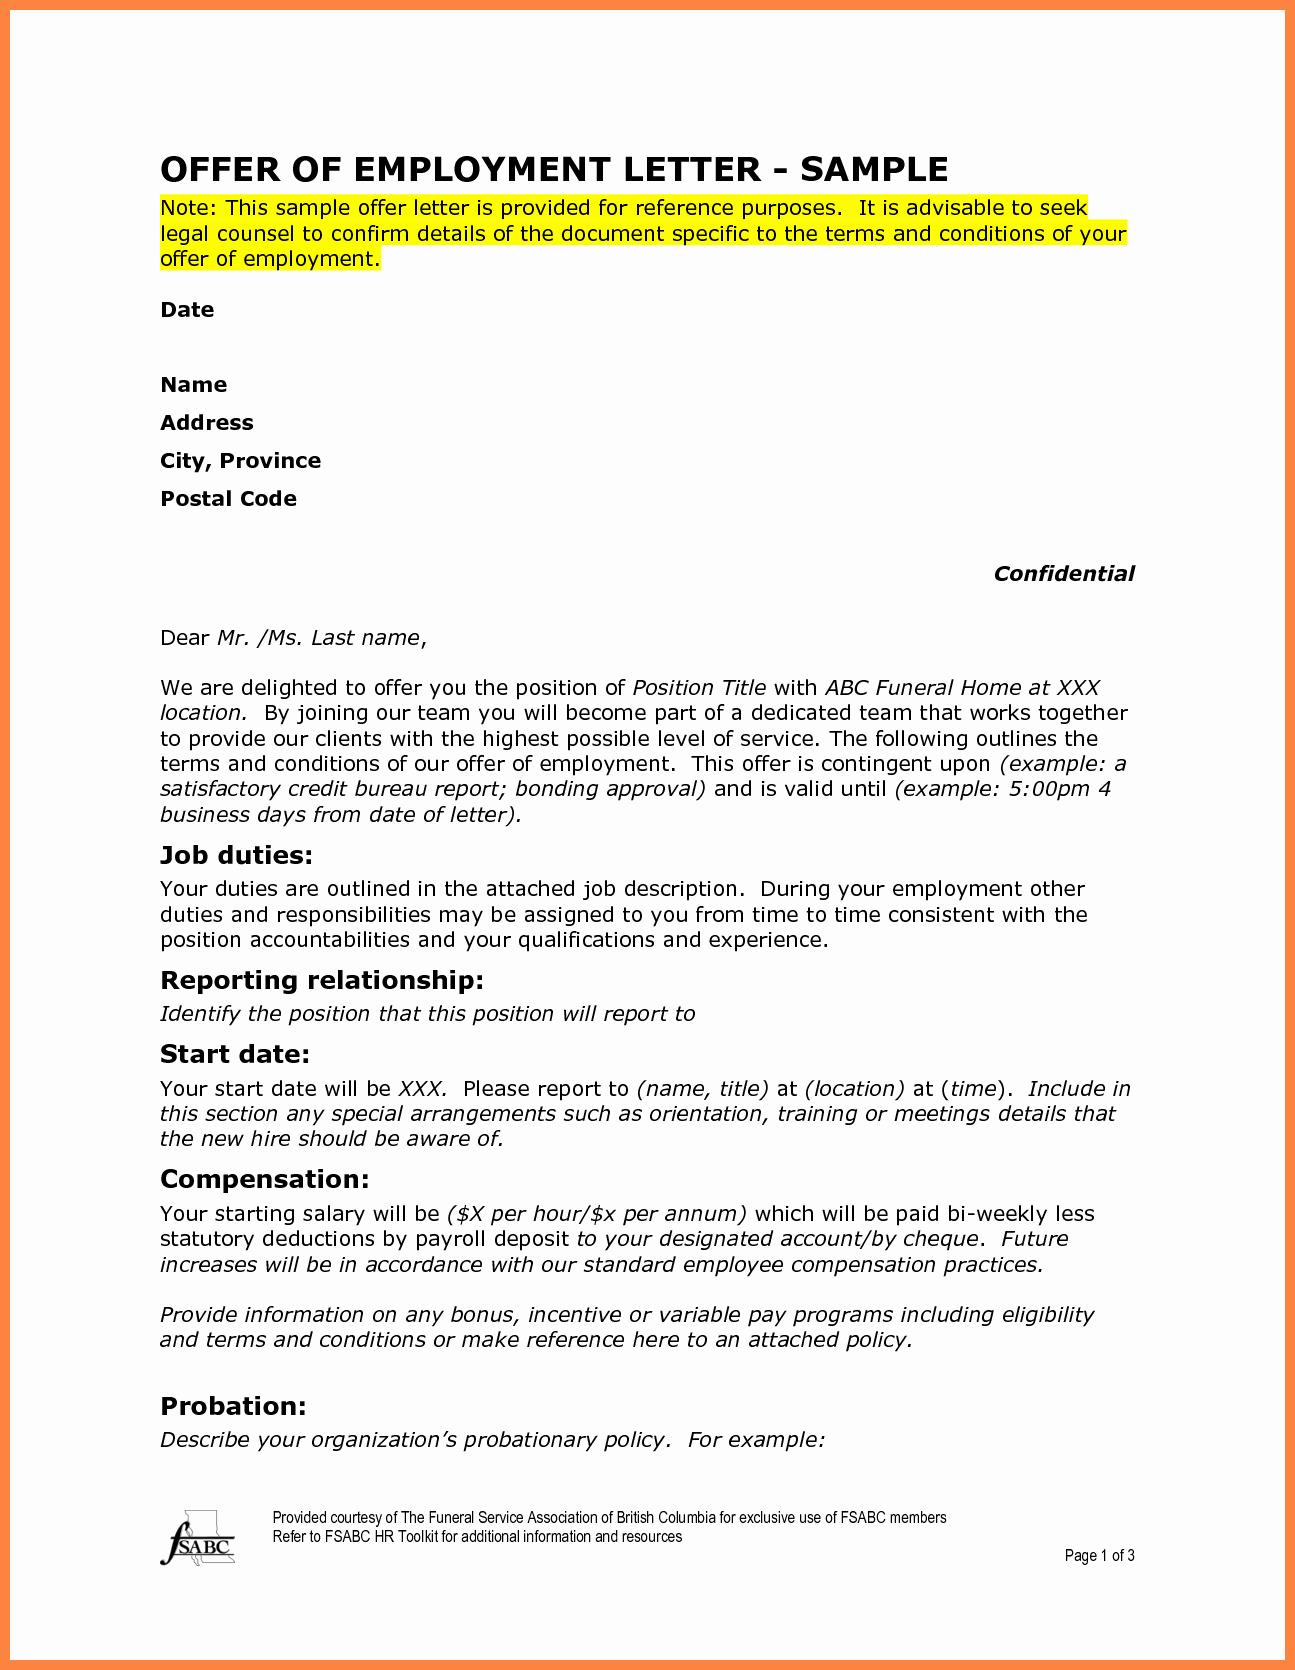 Sample Employment Offer Letter Best Of 10 Offer Of Employment Letter